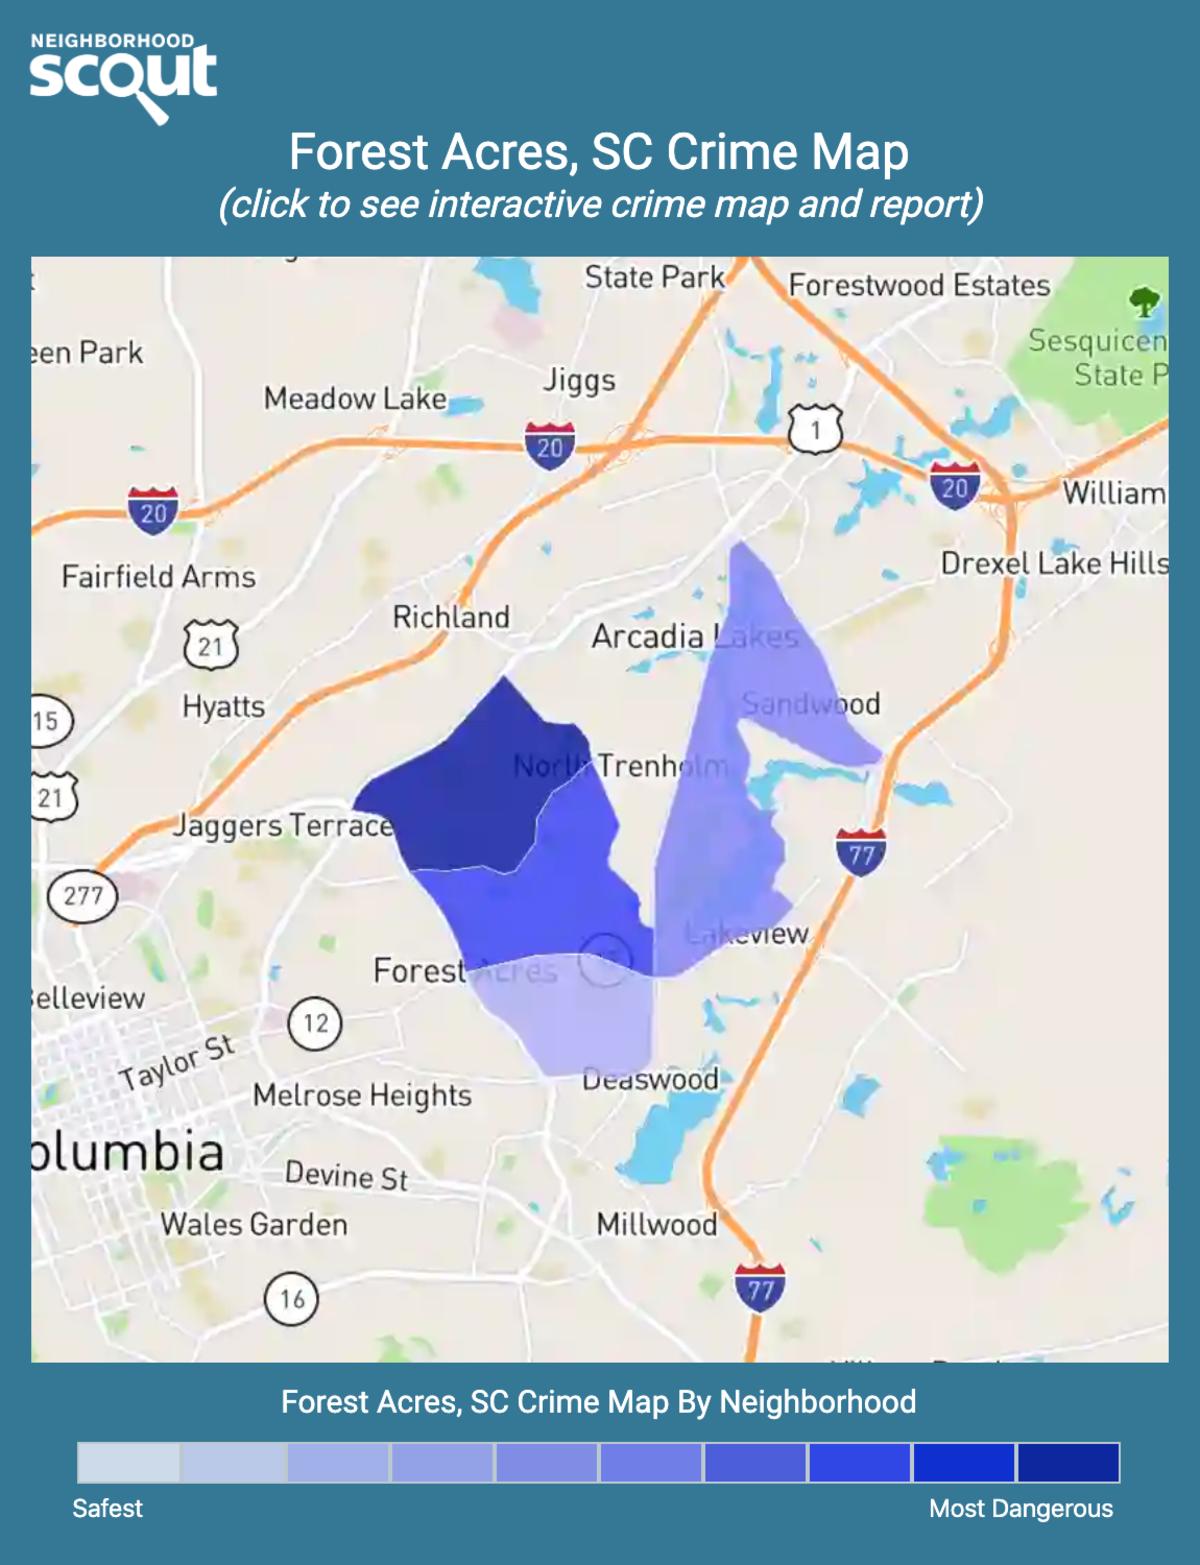 Forest Acres, South Carolina crime map